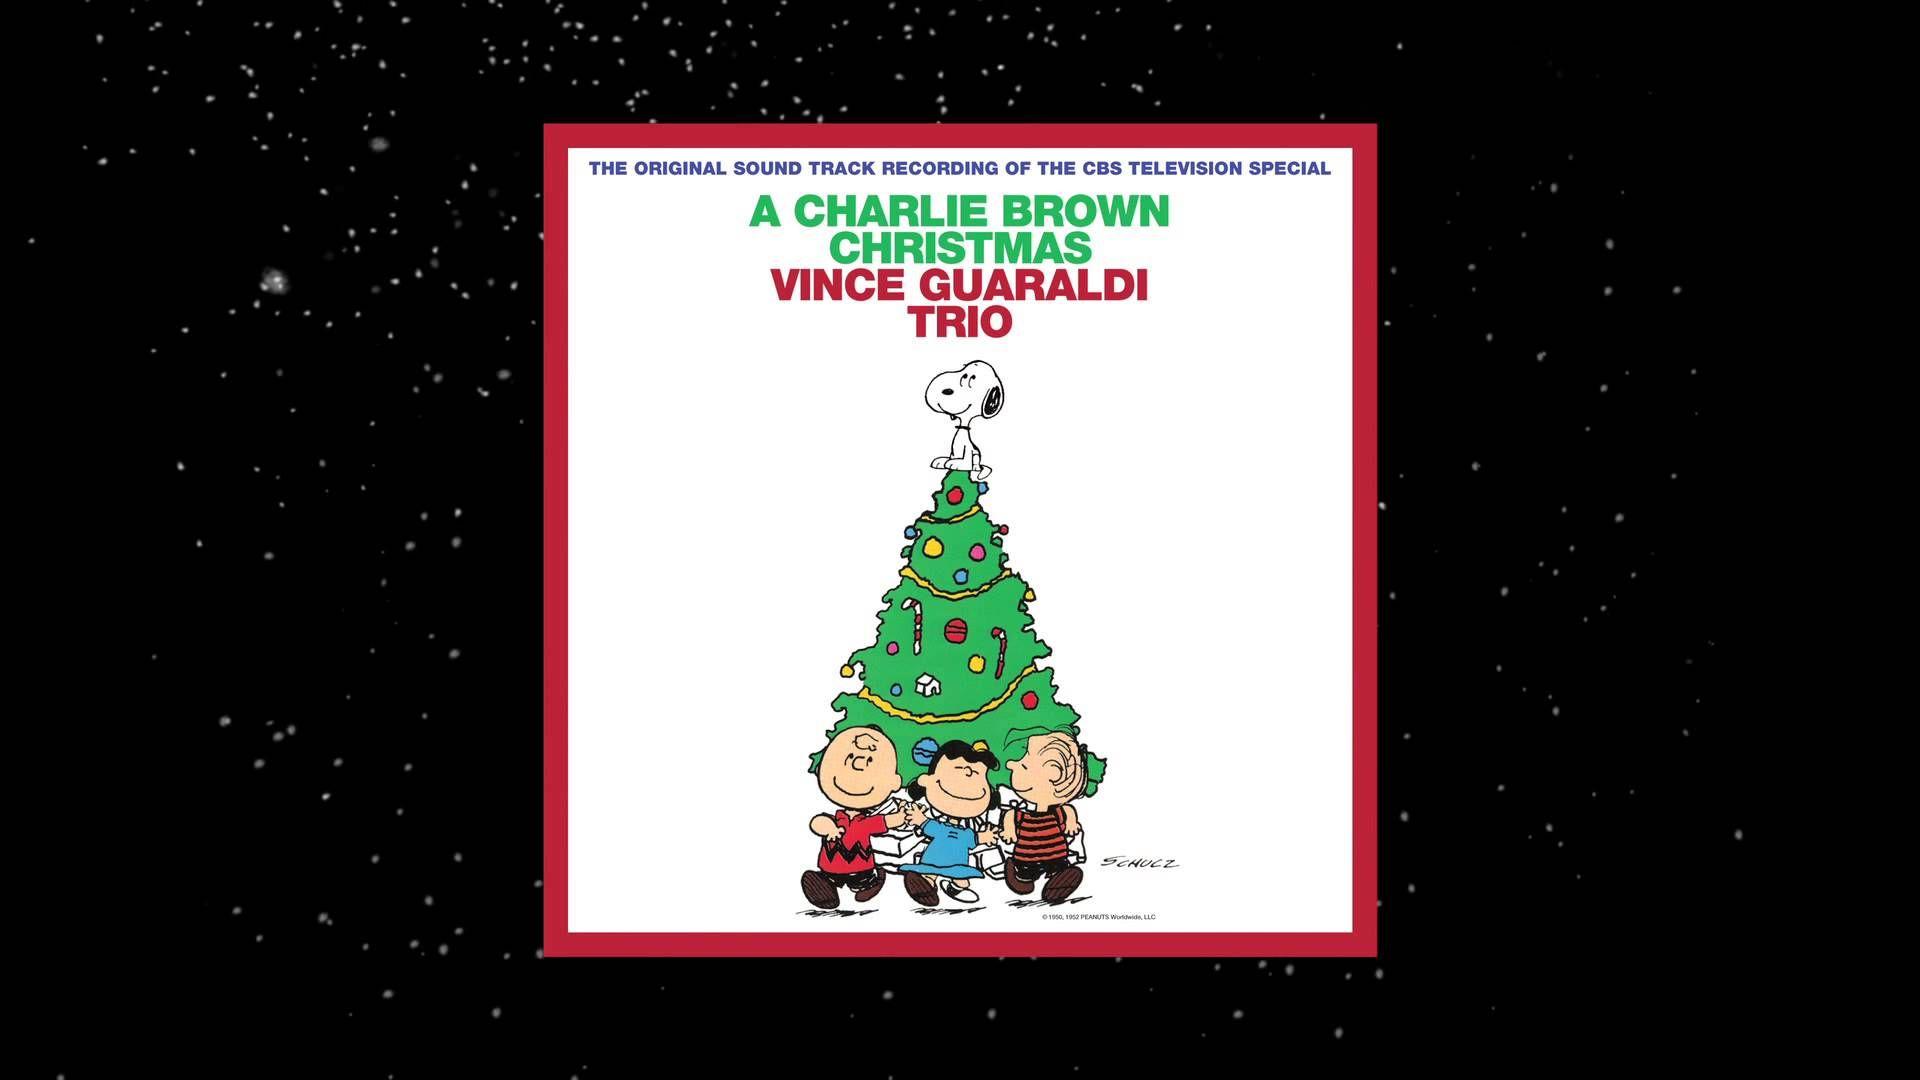 Vince Guaraldi Trio Great Pumpkin Waltz With Images Vince Guaraldi